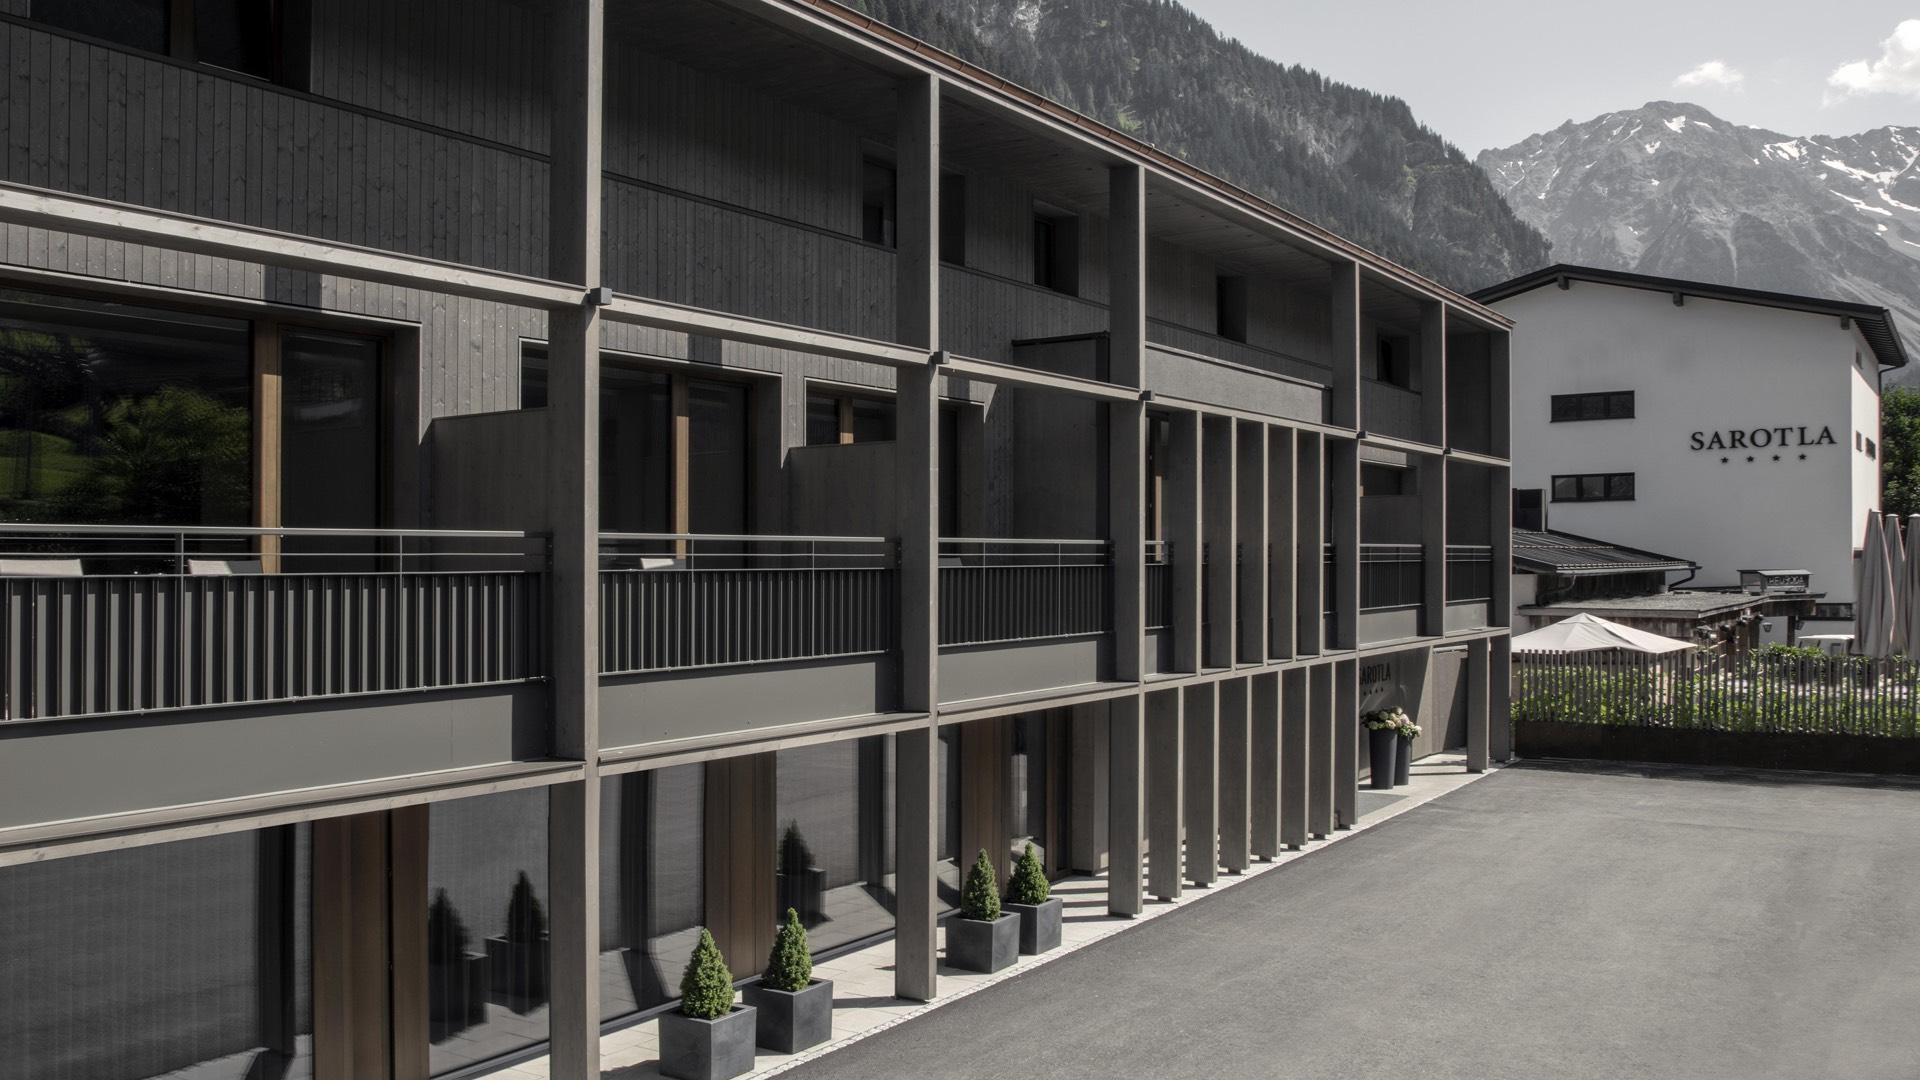 Hotel Sarotla - Frontansicht